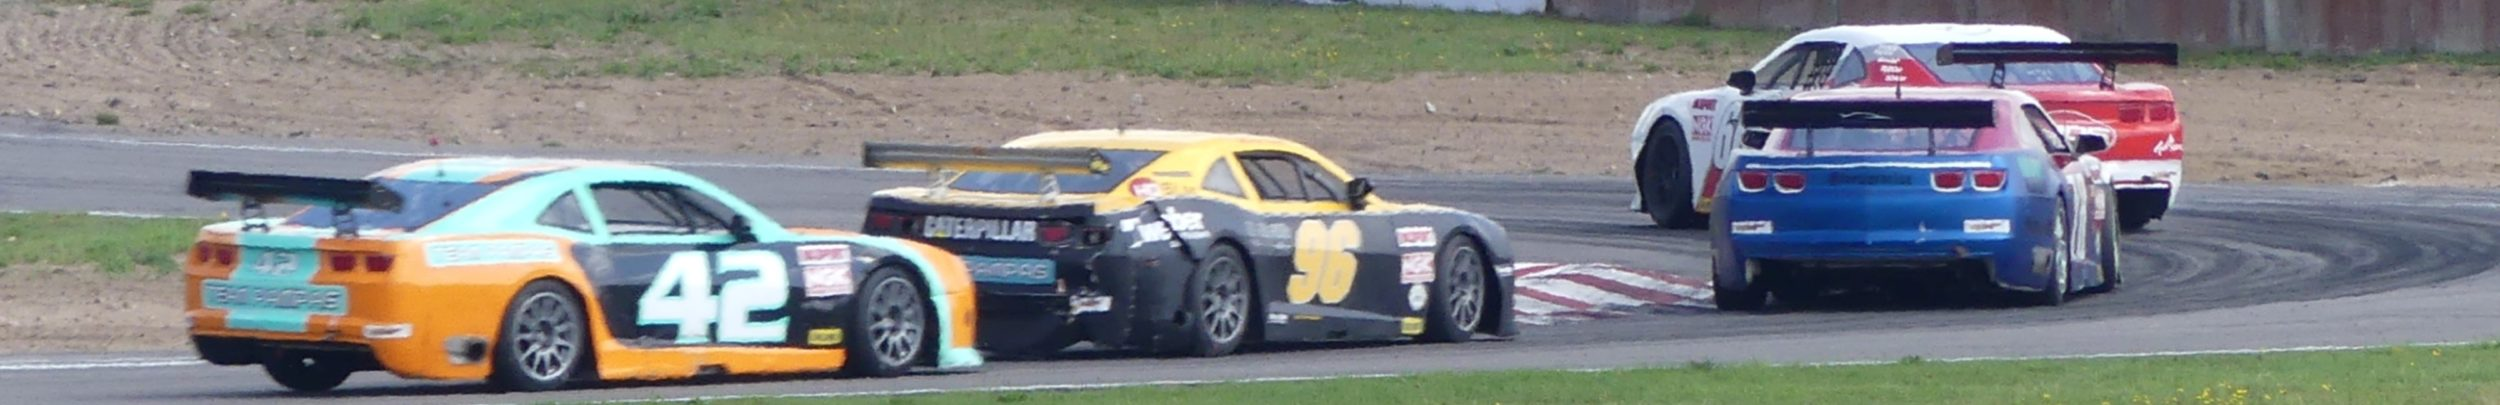 Pure Thunder Racing